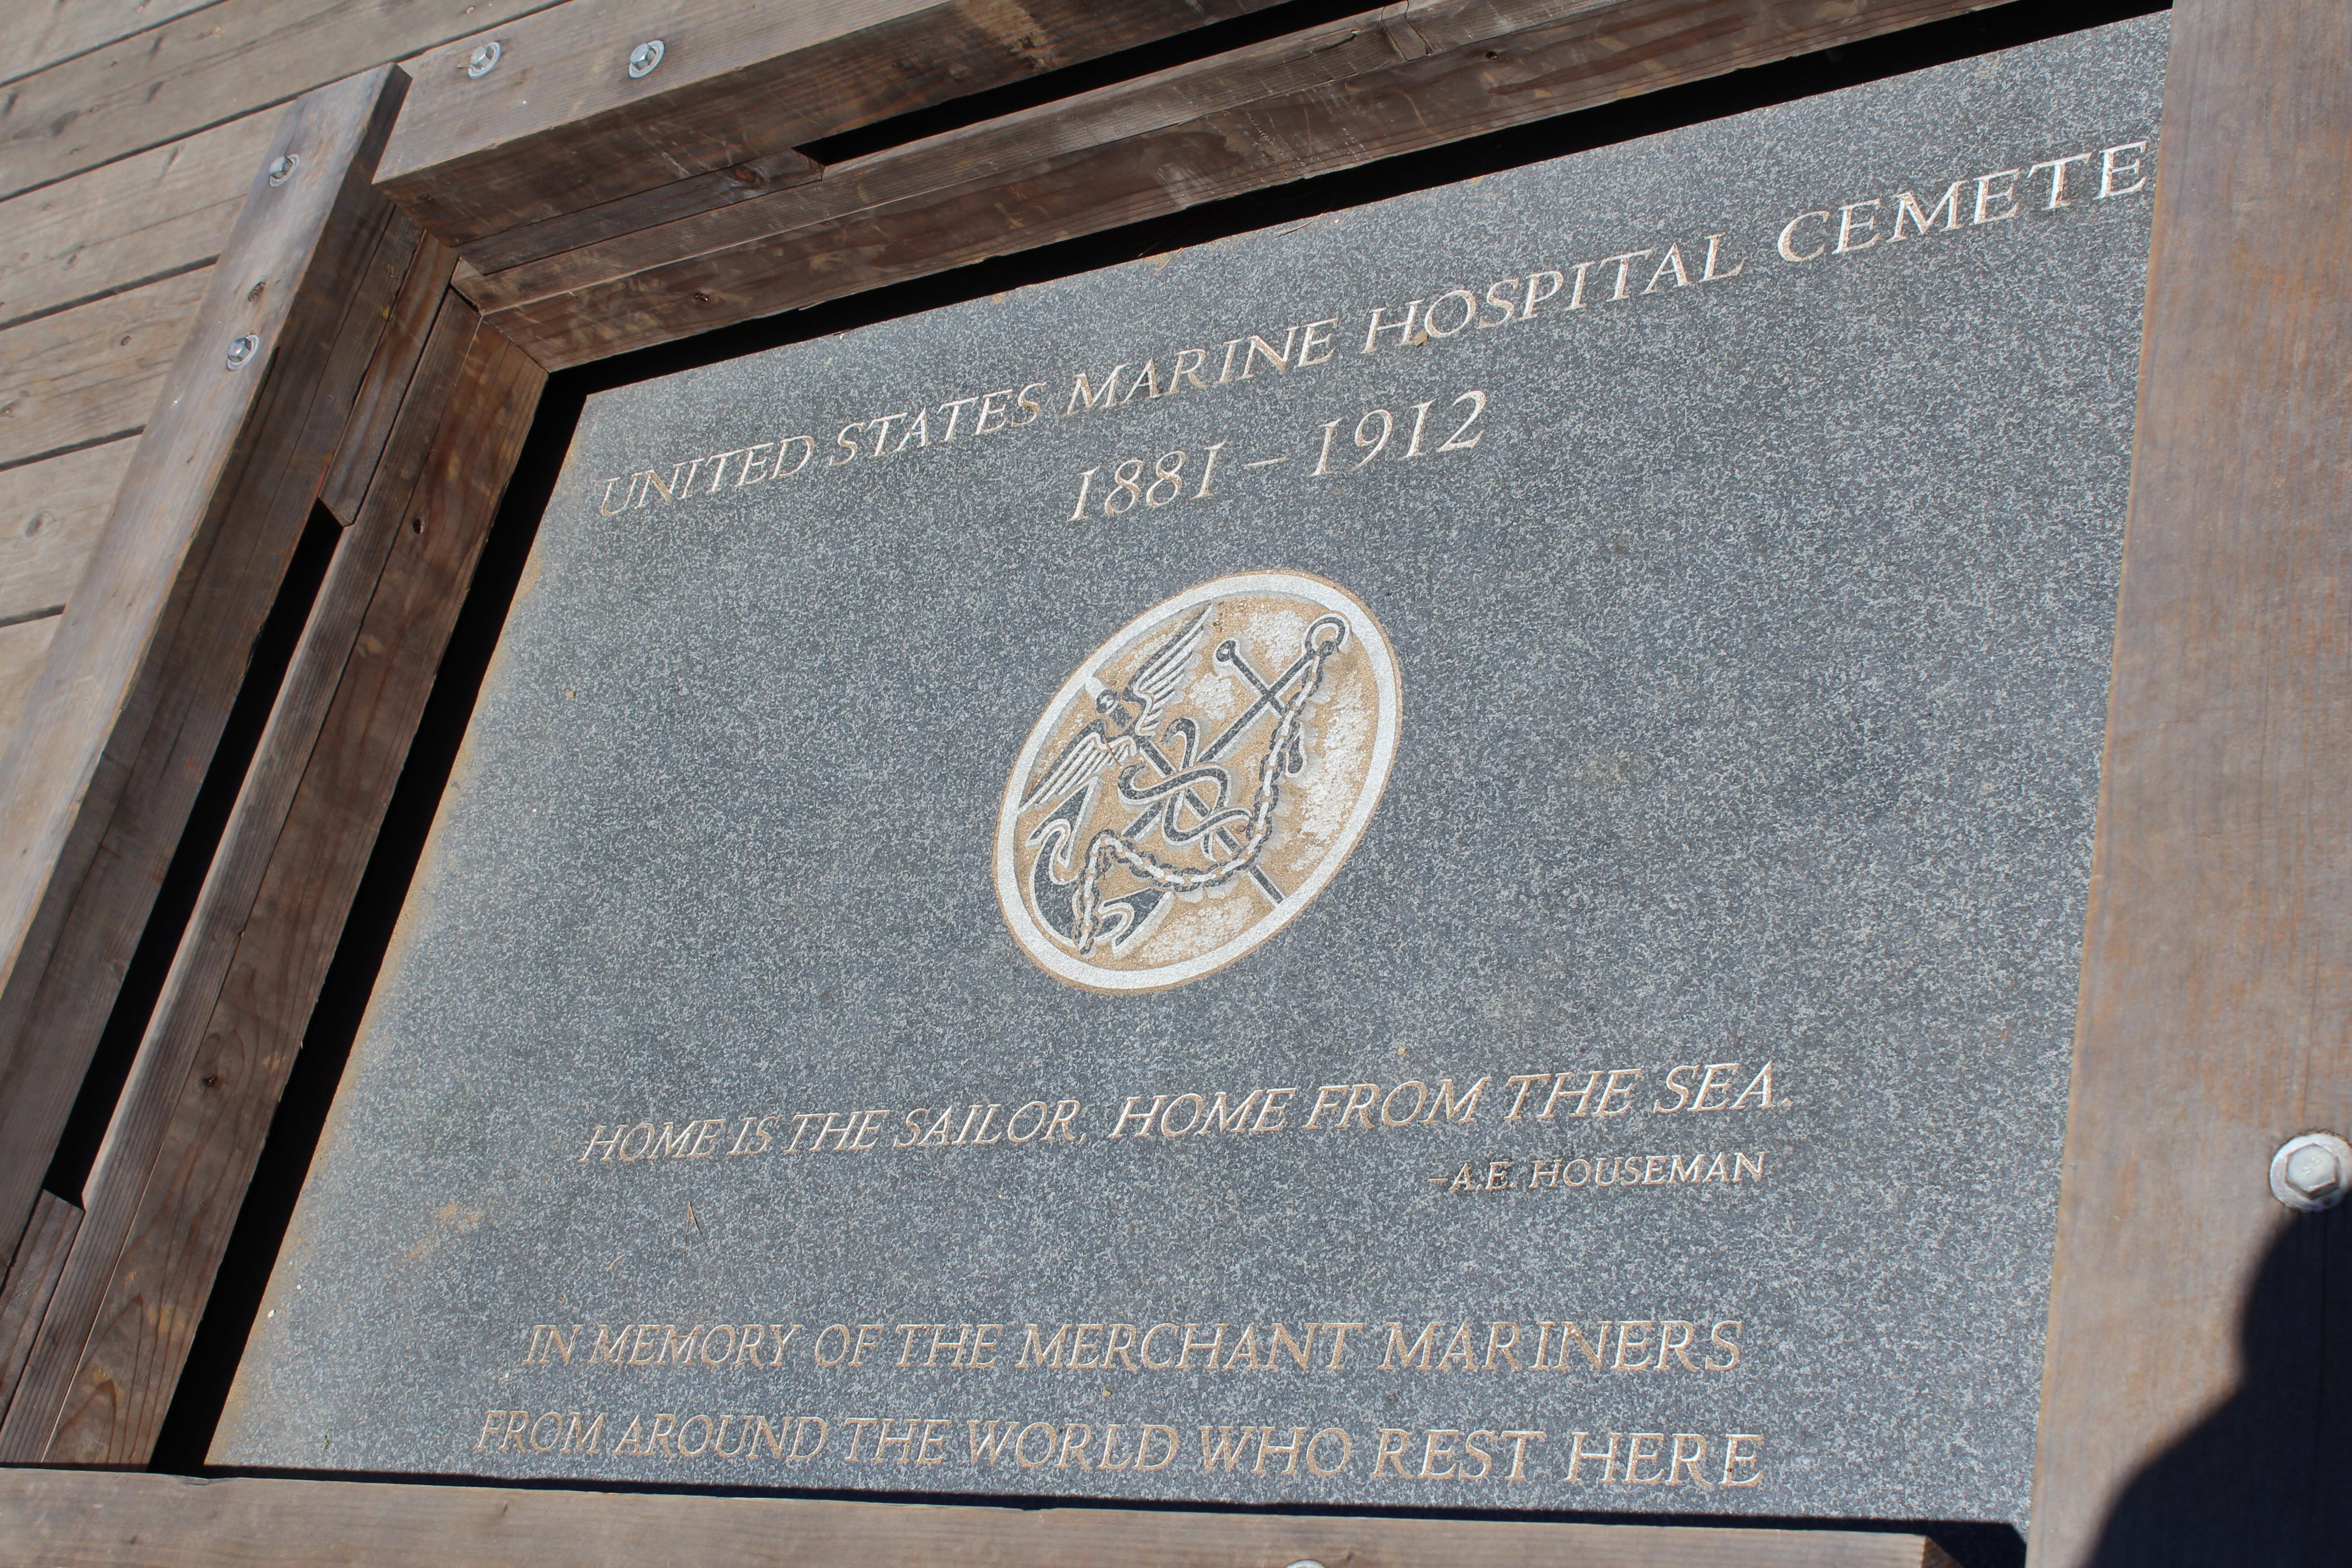 Marine Cemetery Vista Memorial (image from Cemetery Travel)